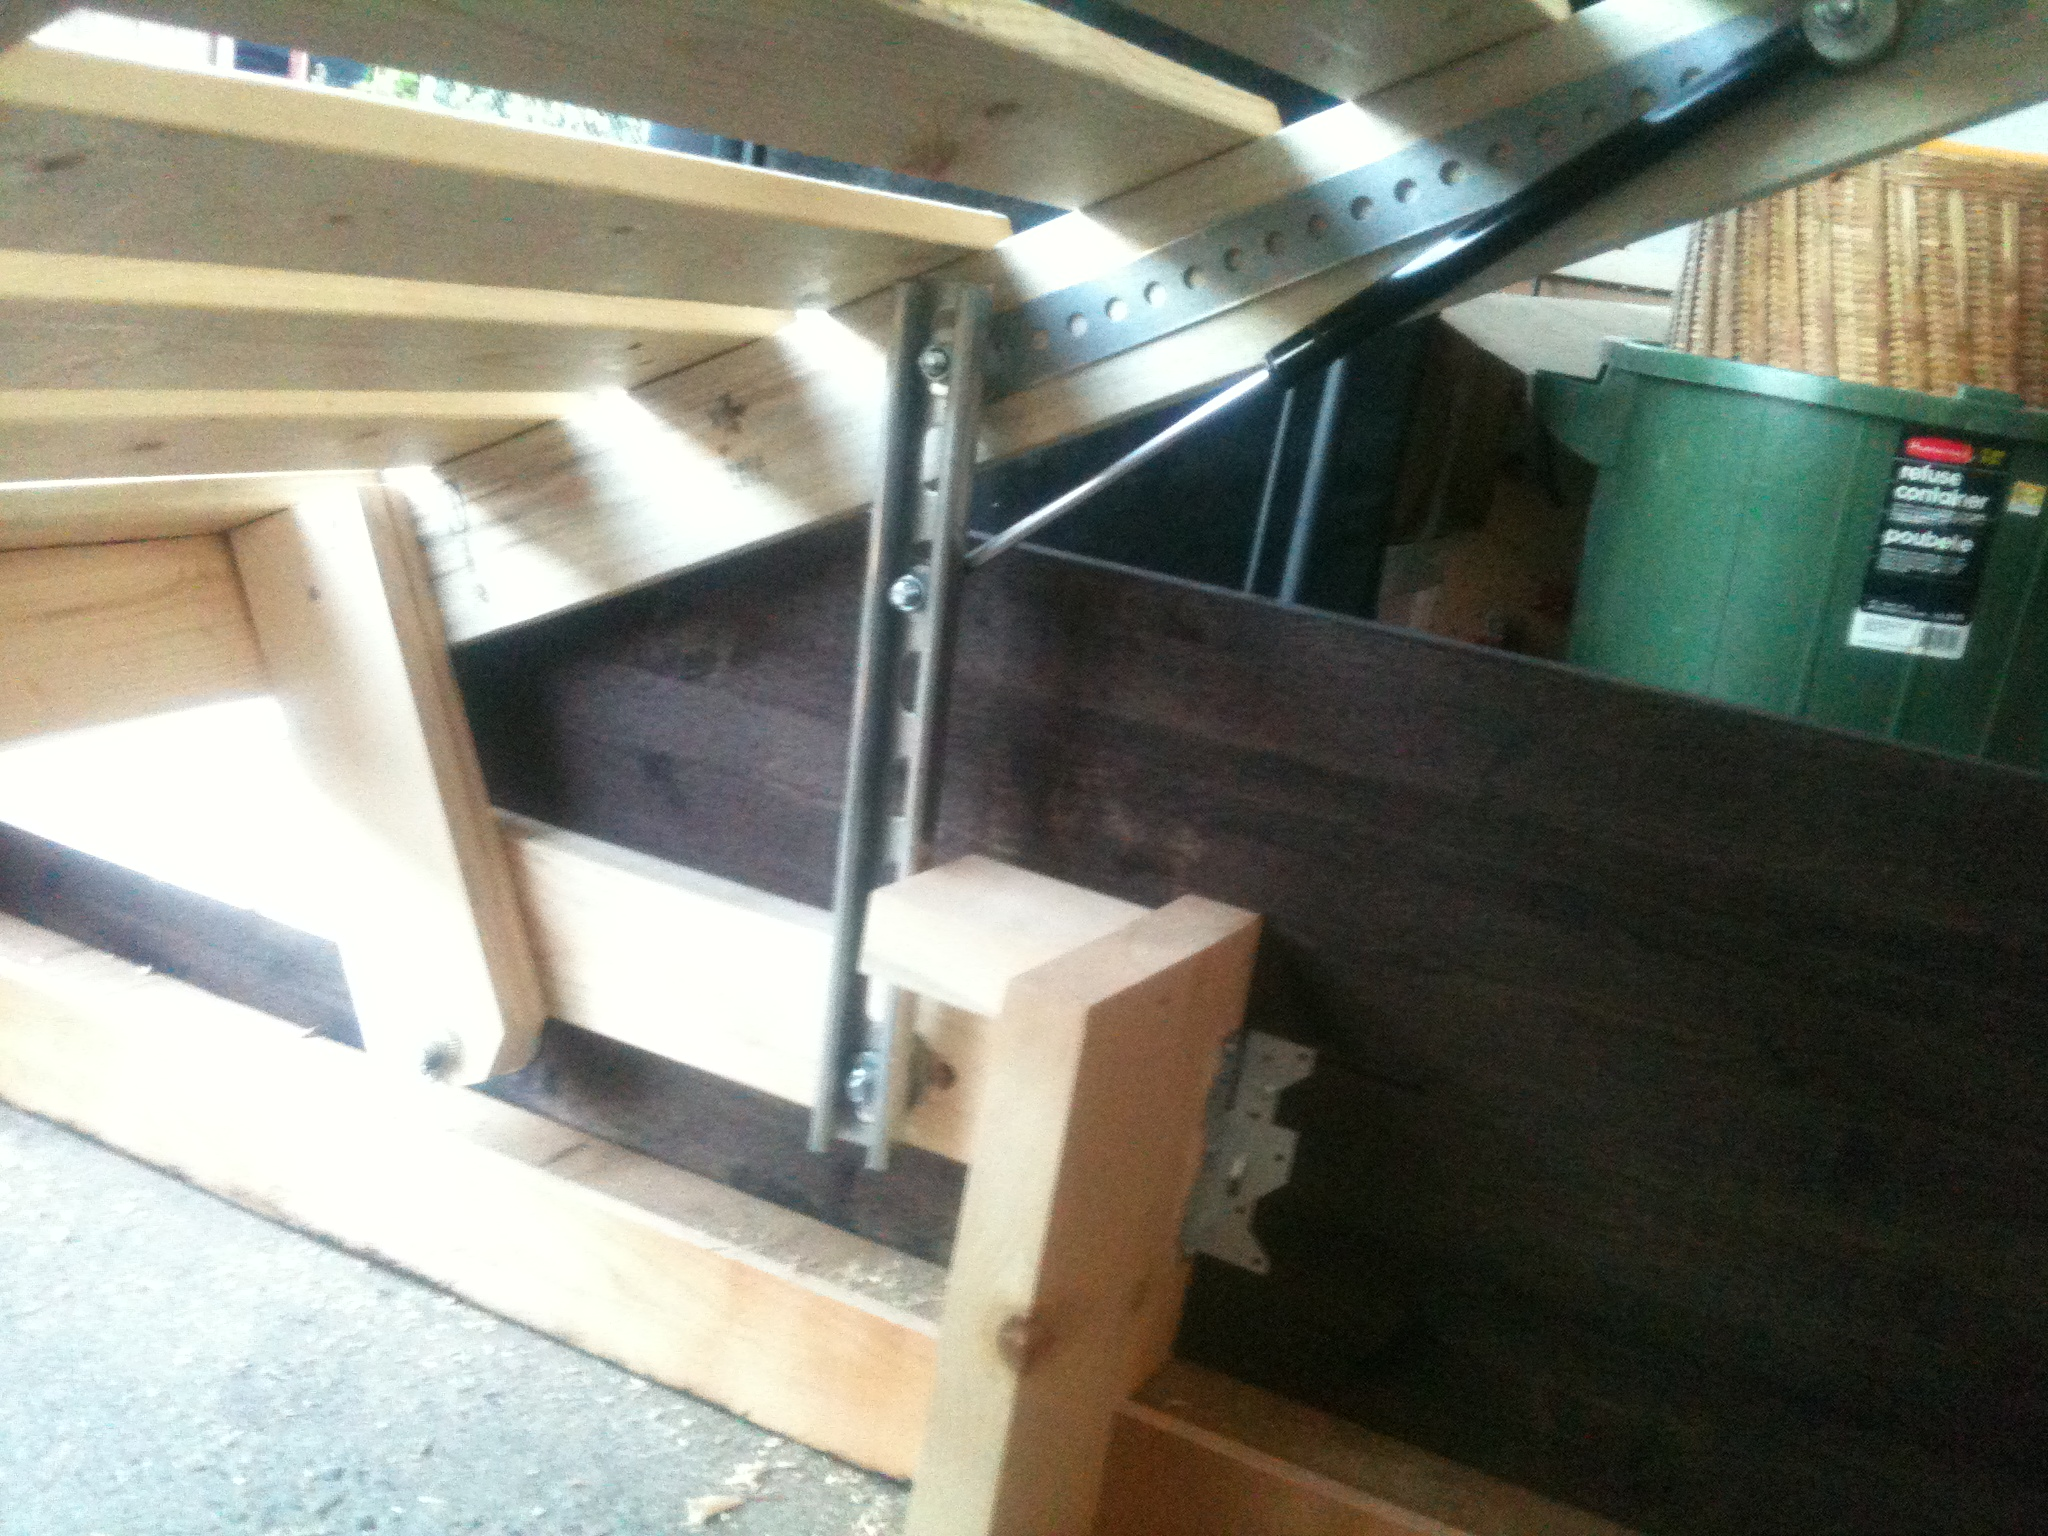 Photos of Storage Bed Lift Mechanism & Storage Bed: Storage Bed Lift Mechanism